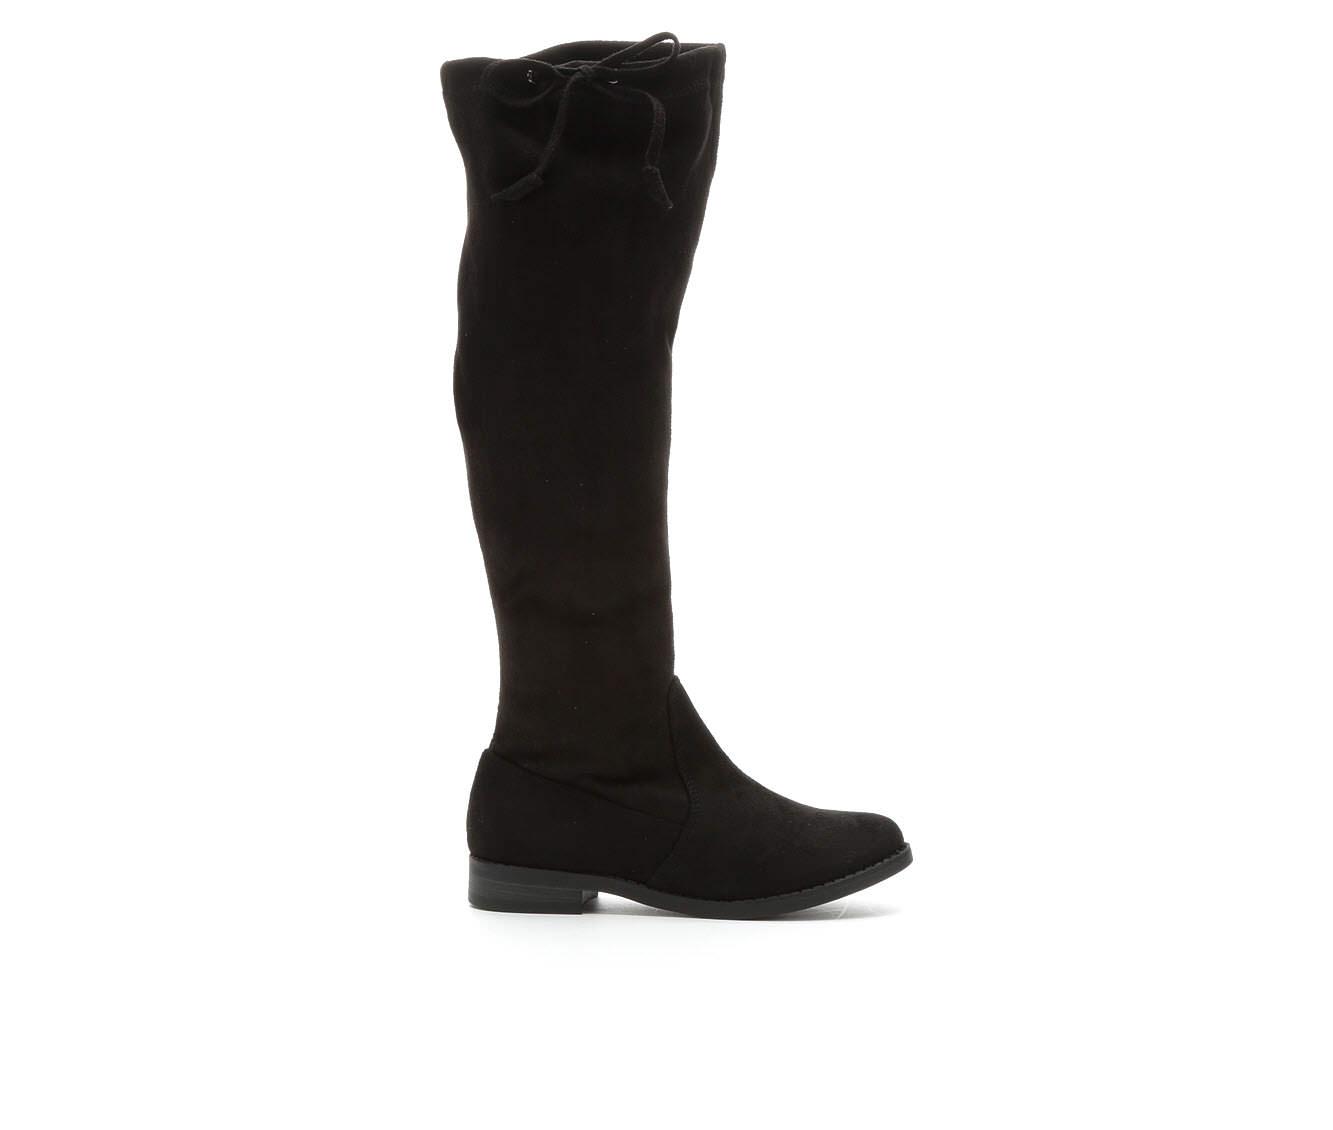 Girls' Jessica Simpson Marissa Boots (Black)